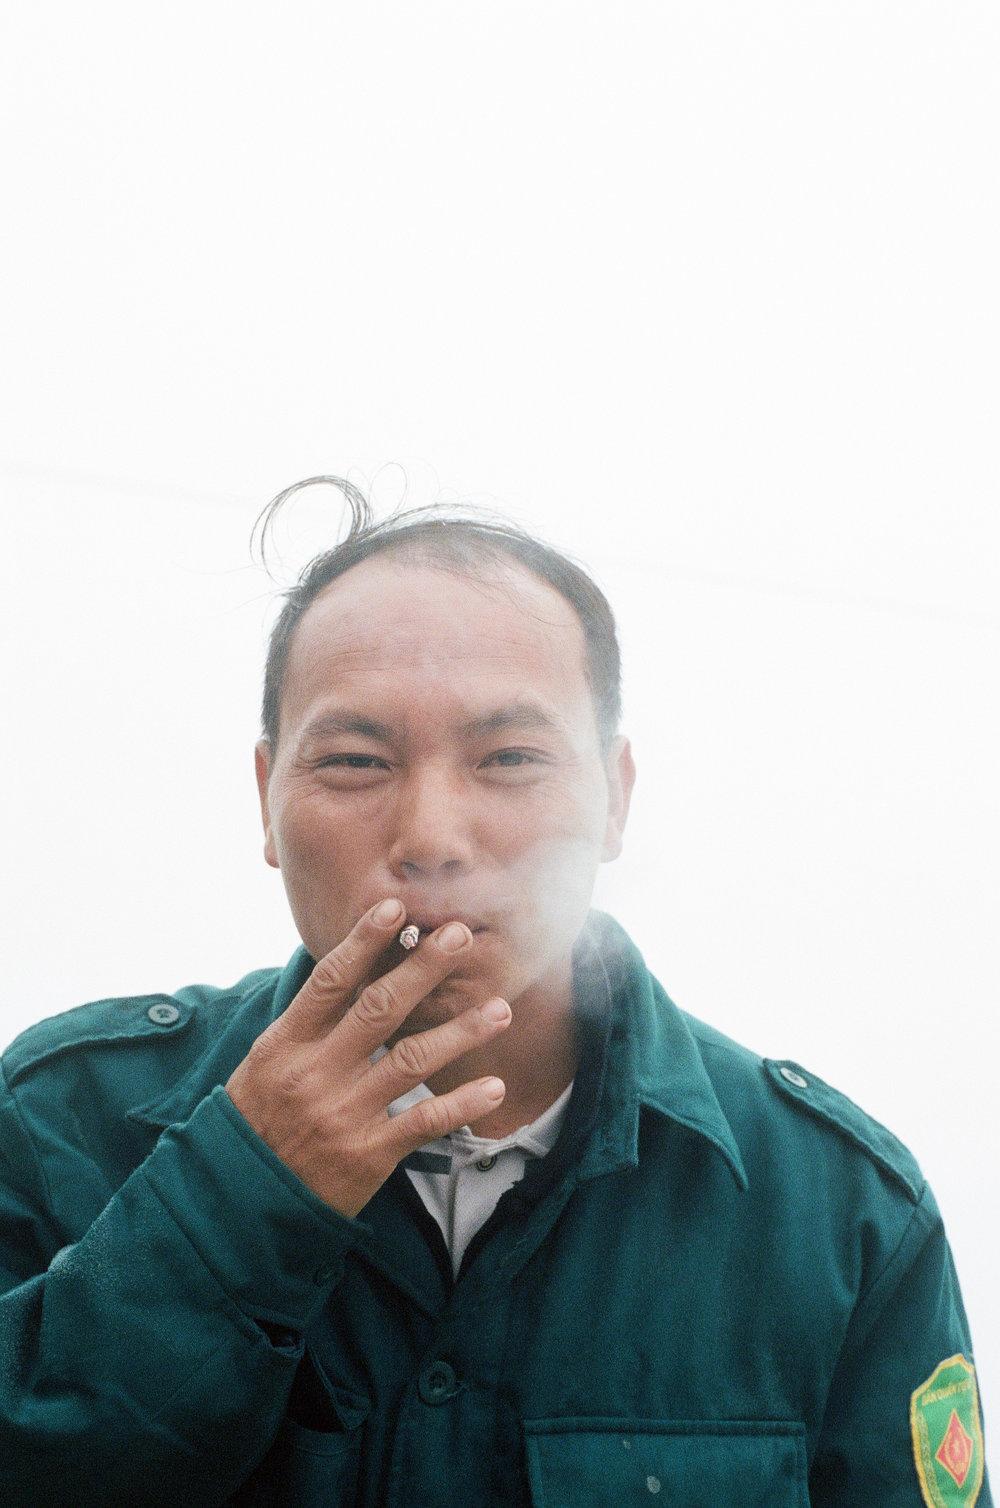 smokehaze.jpg